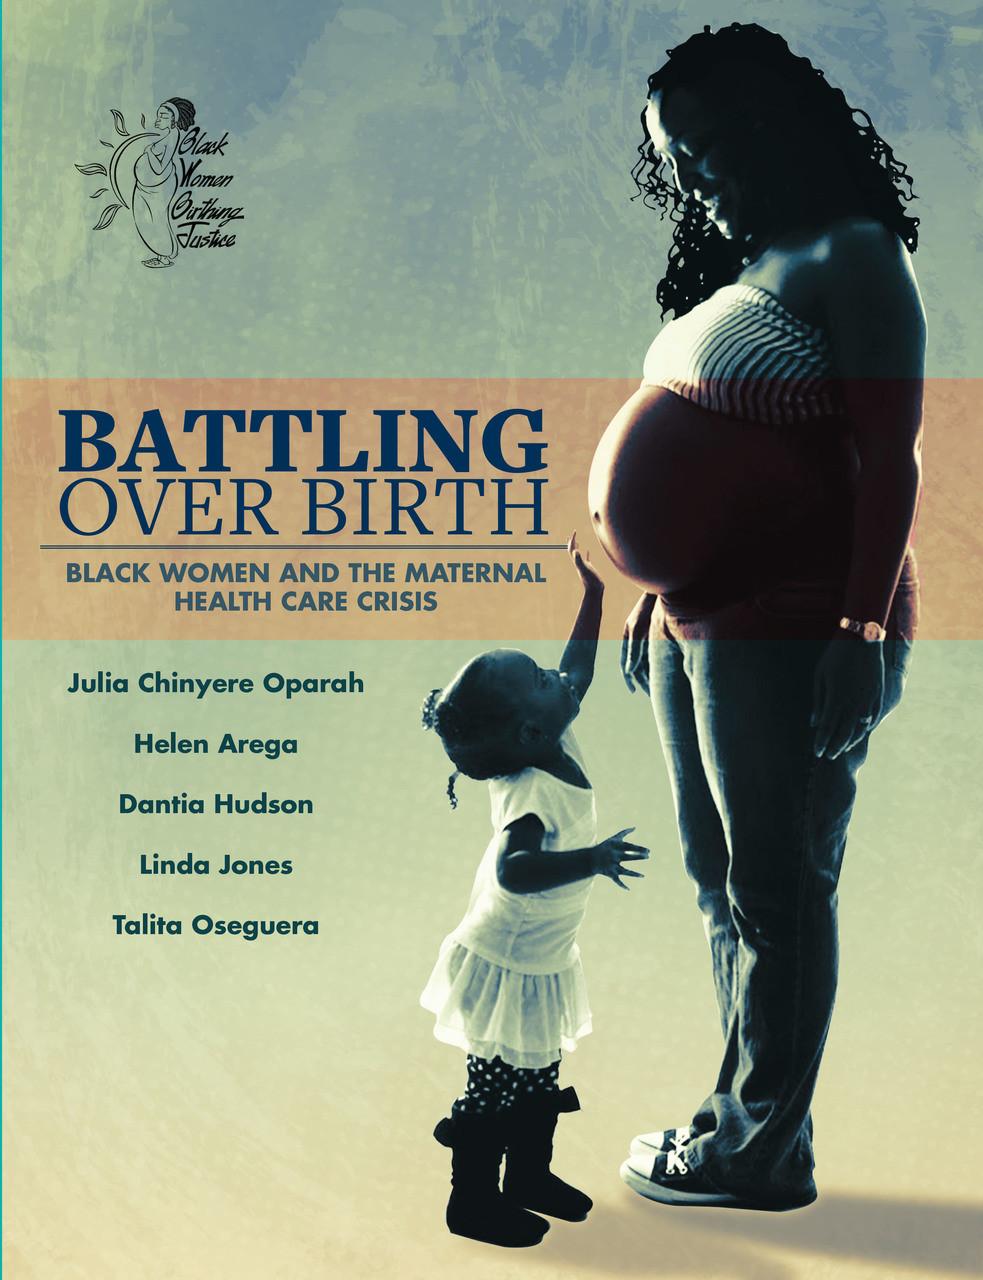 Battling Over Birth